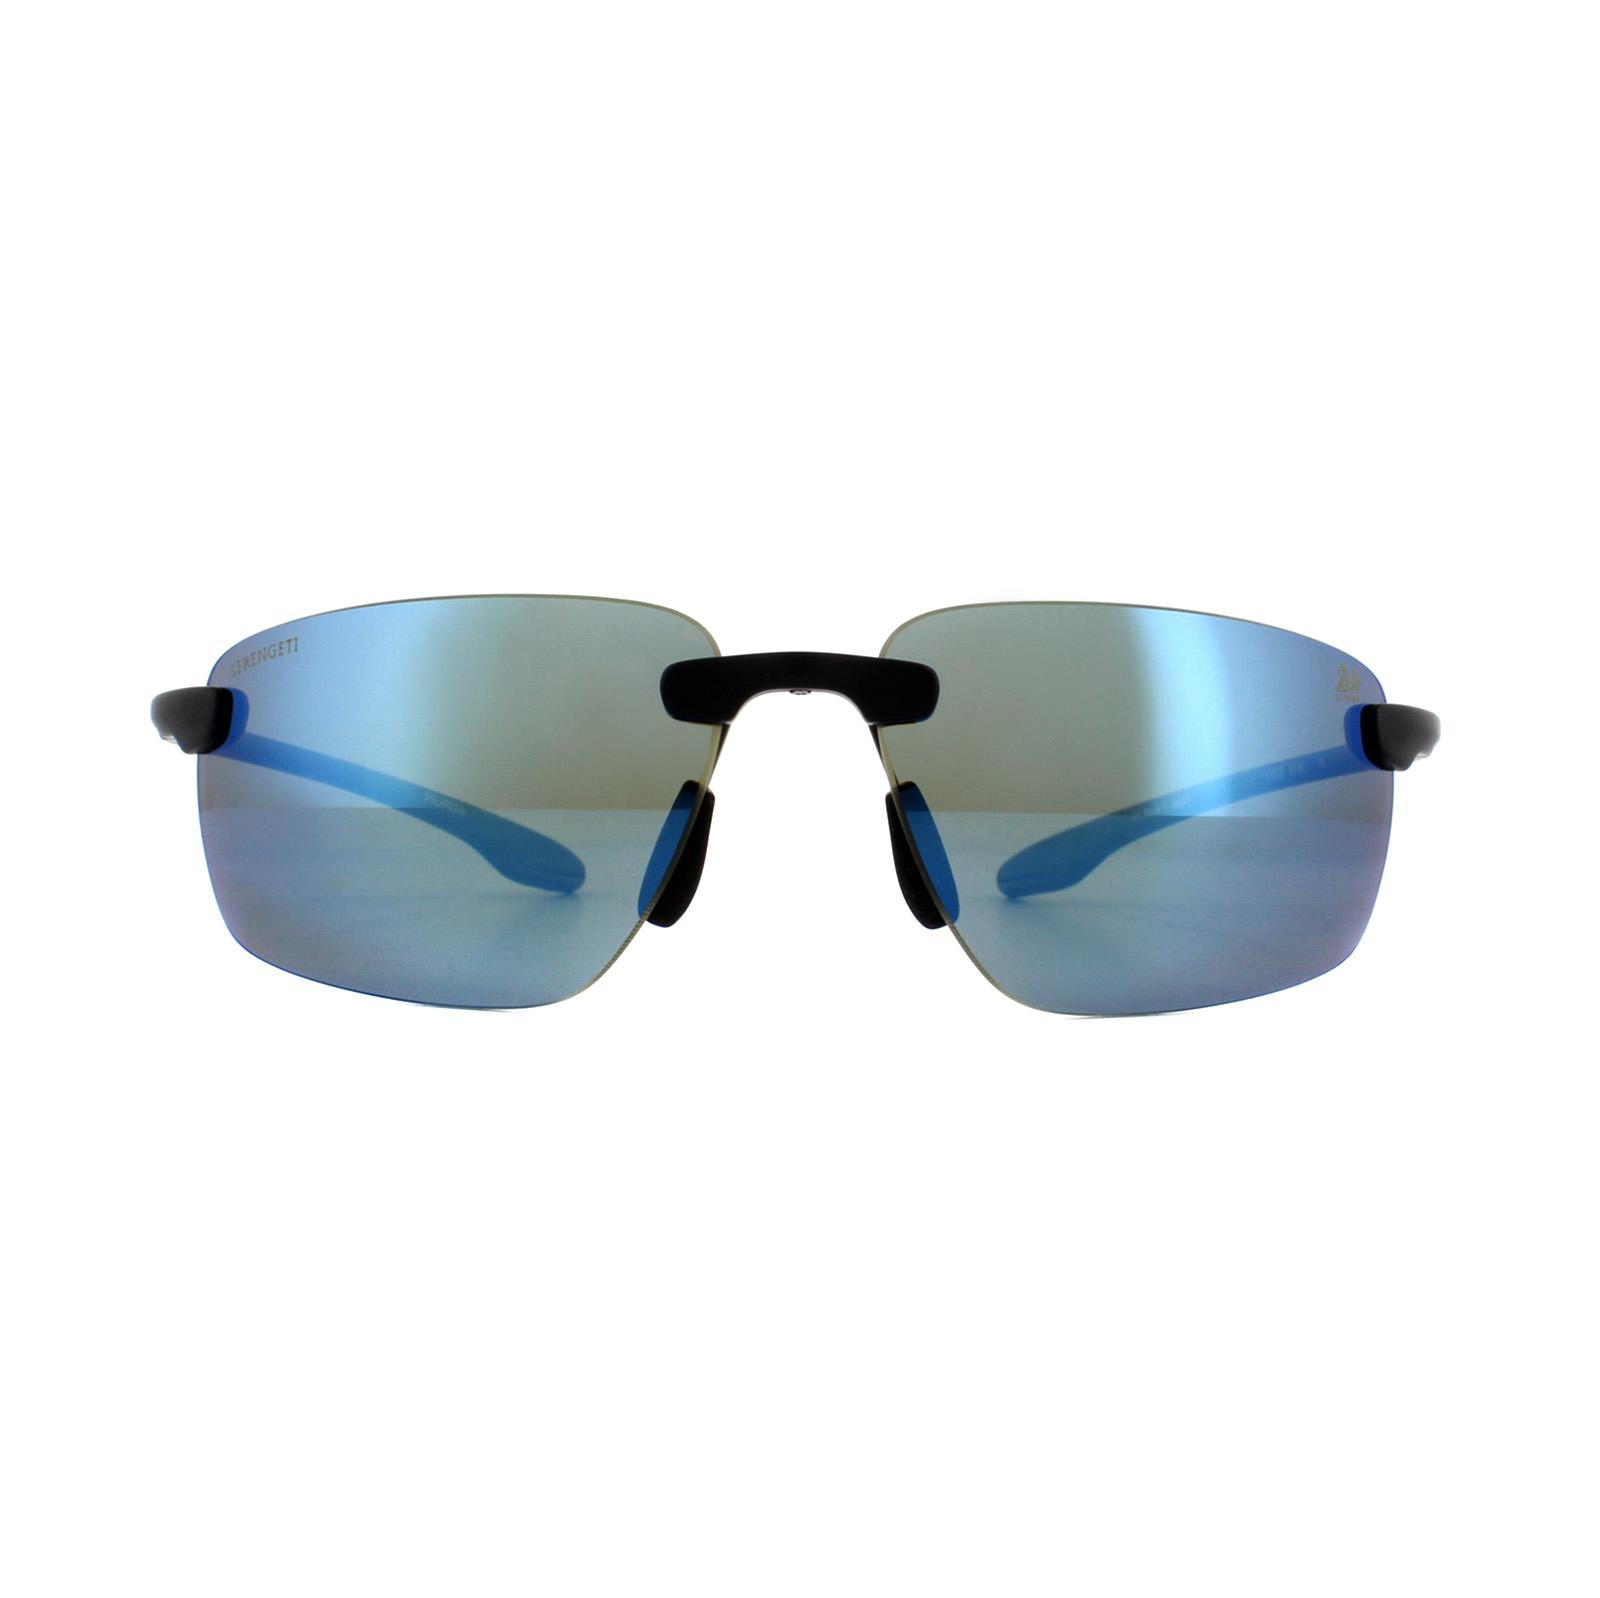 93a117122e Serengeti Erice Sunglasses Thumbnail 1 Serengeti Erice Sunglasses Thumbnail  2 ...